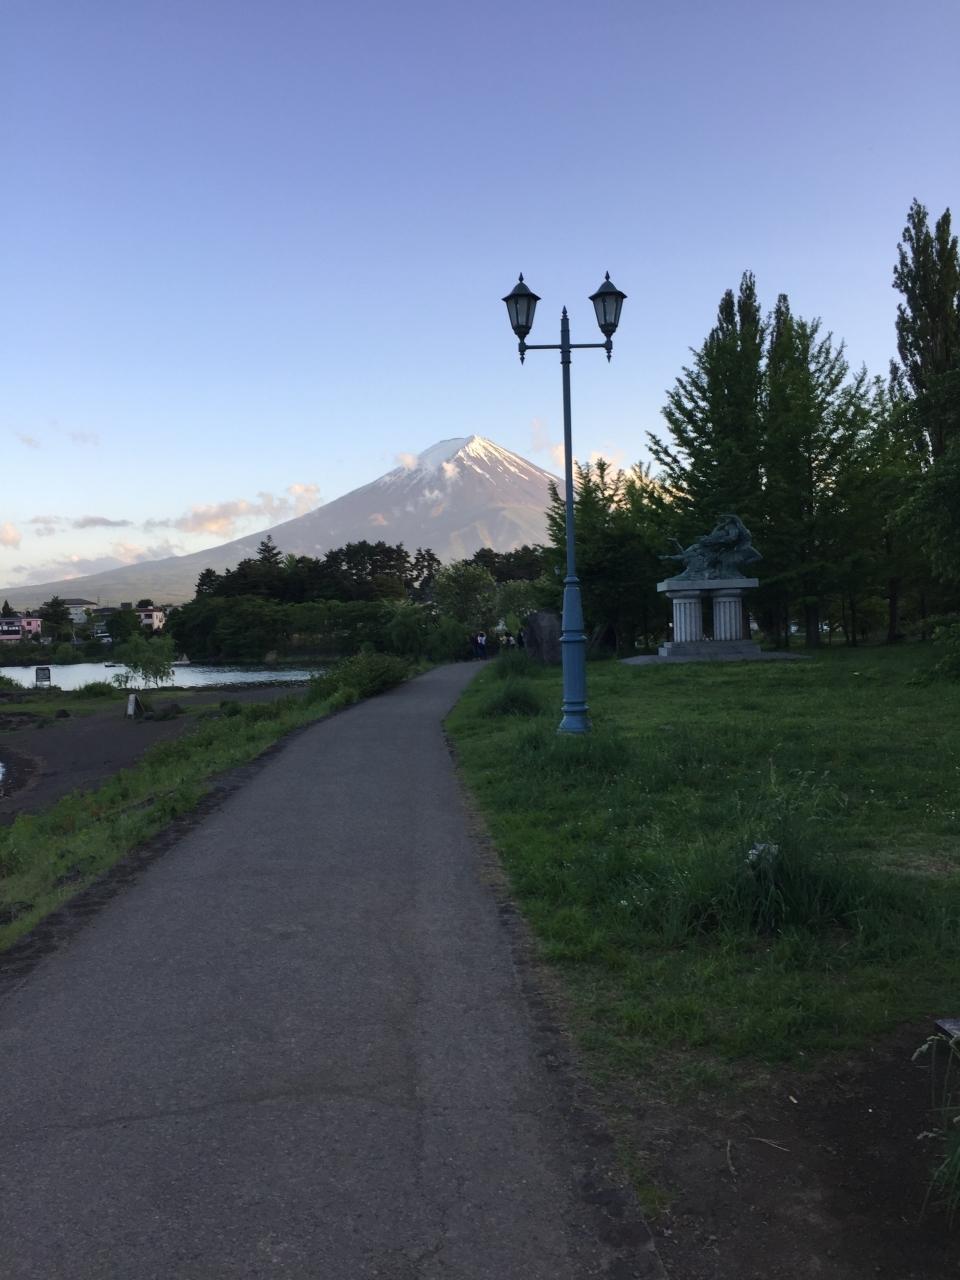 芝生広場と湖と富士山 絶景